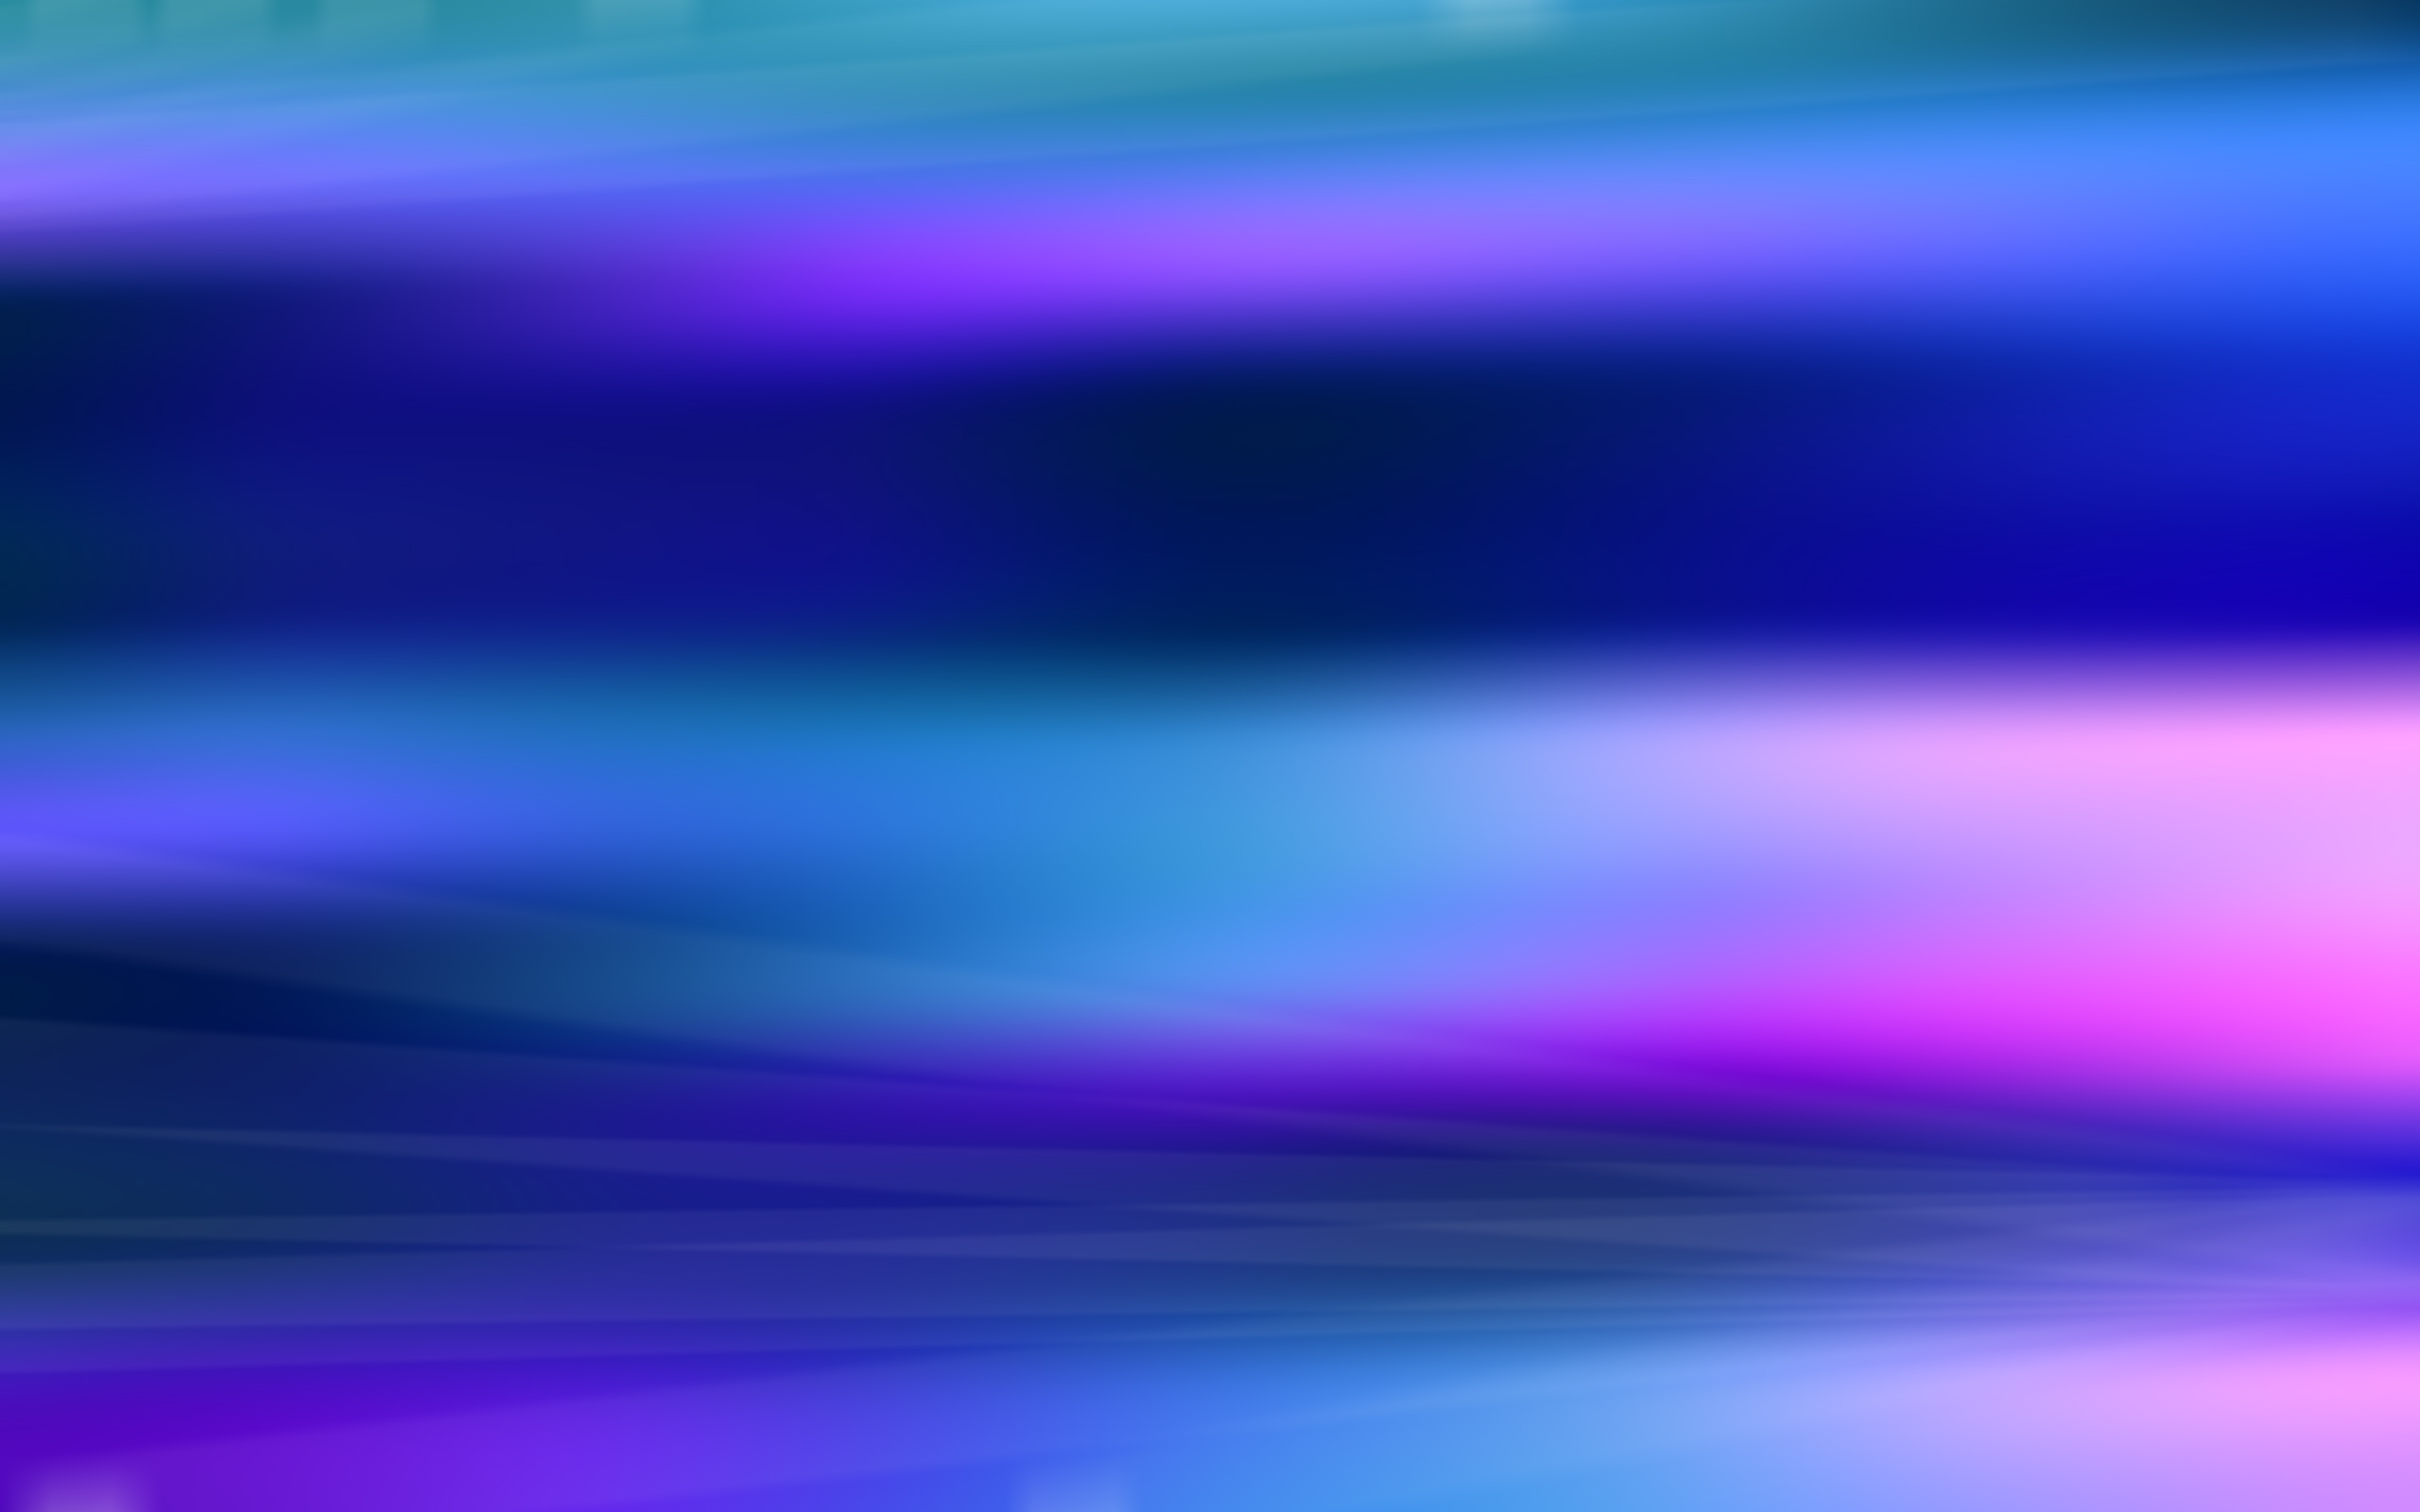 Free Motion Desktop Backgrounds - WallpaperSafari